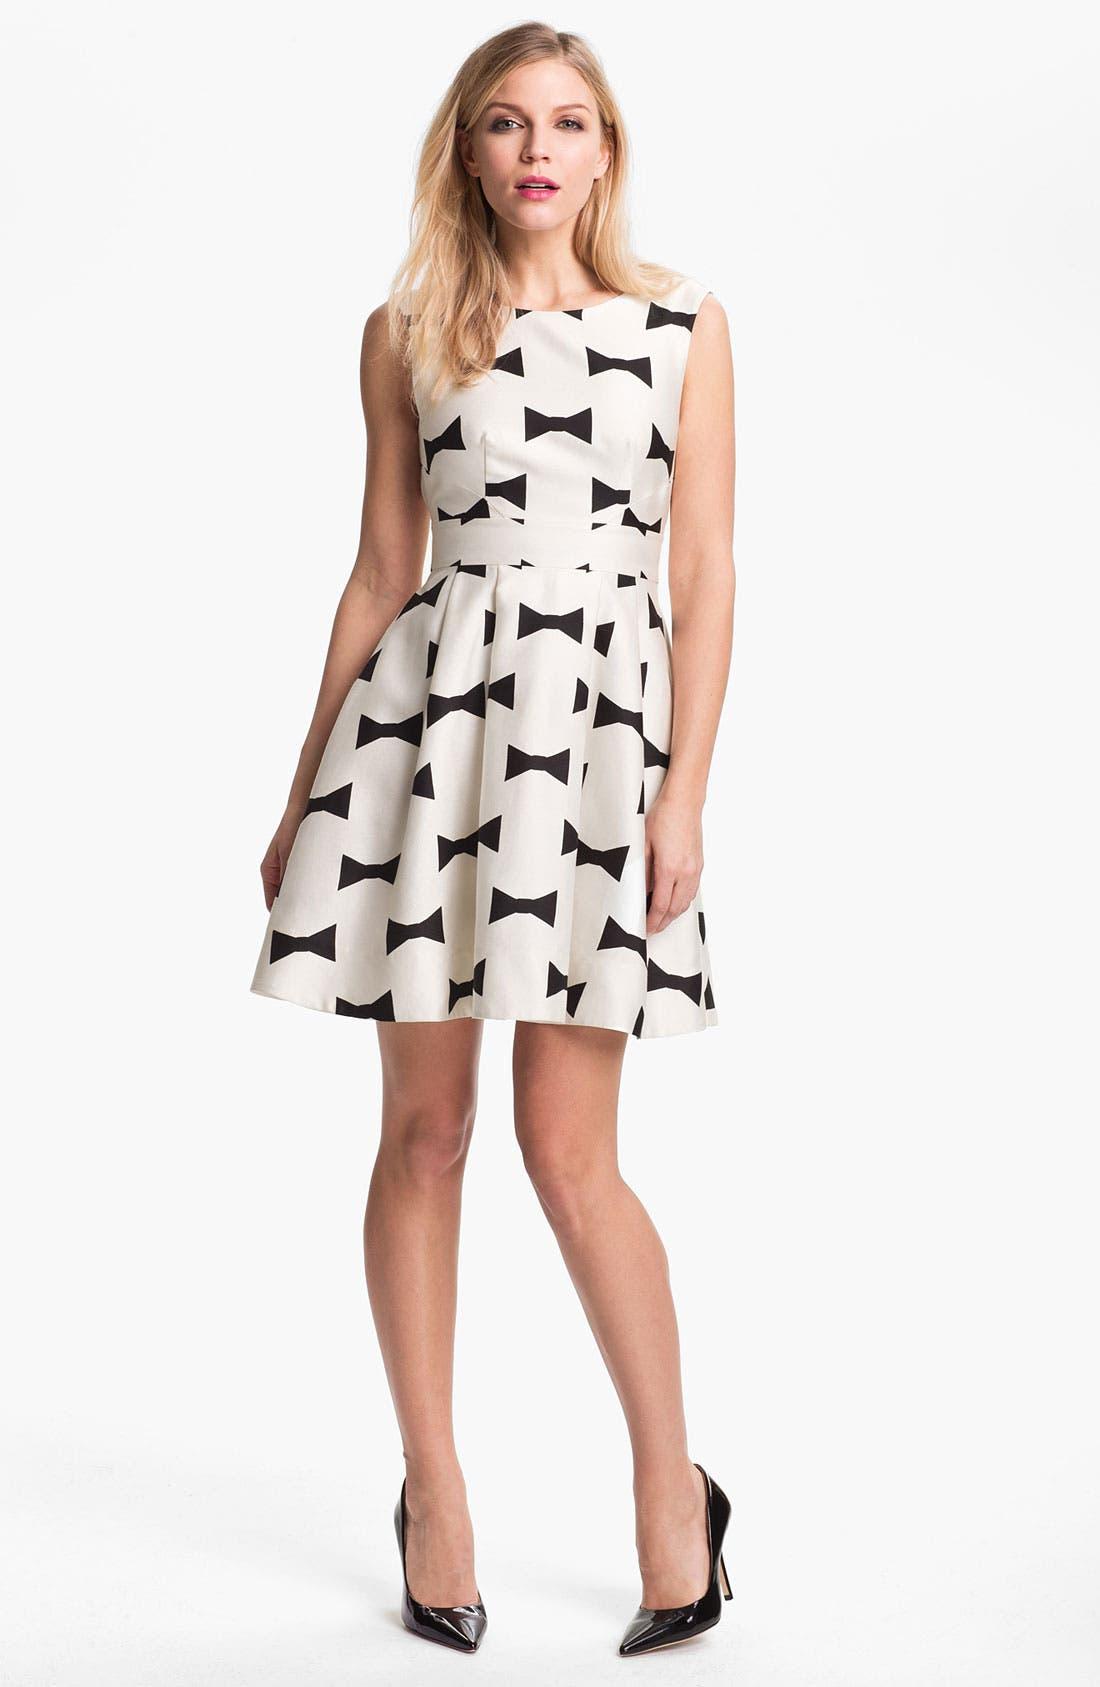 Alternate Image 1 Selected - kate spade new york 'marilyn' fit & flare dress